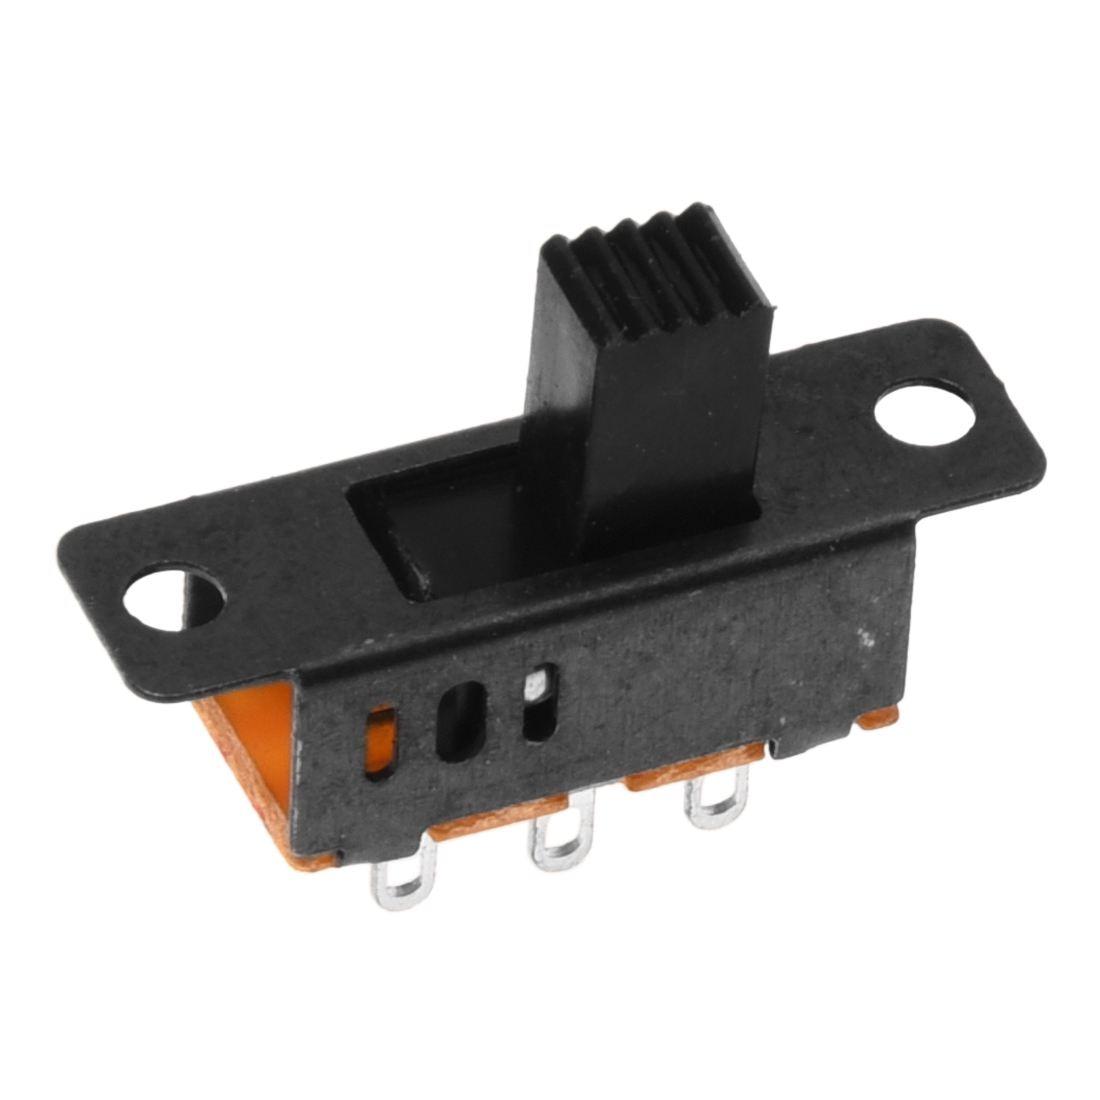 10 x DC 0.5A 50V 3 Position 2P2T DPDT Panel Mount Slide Switch SS23D32